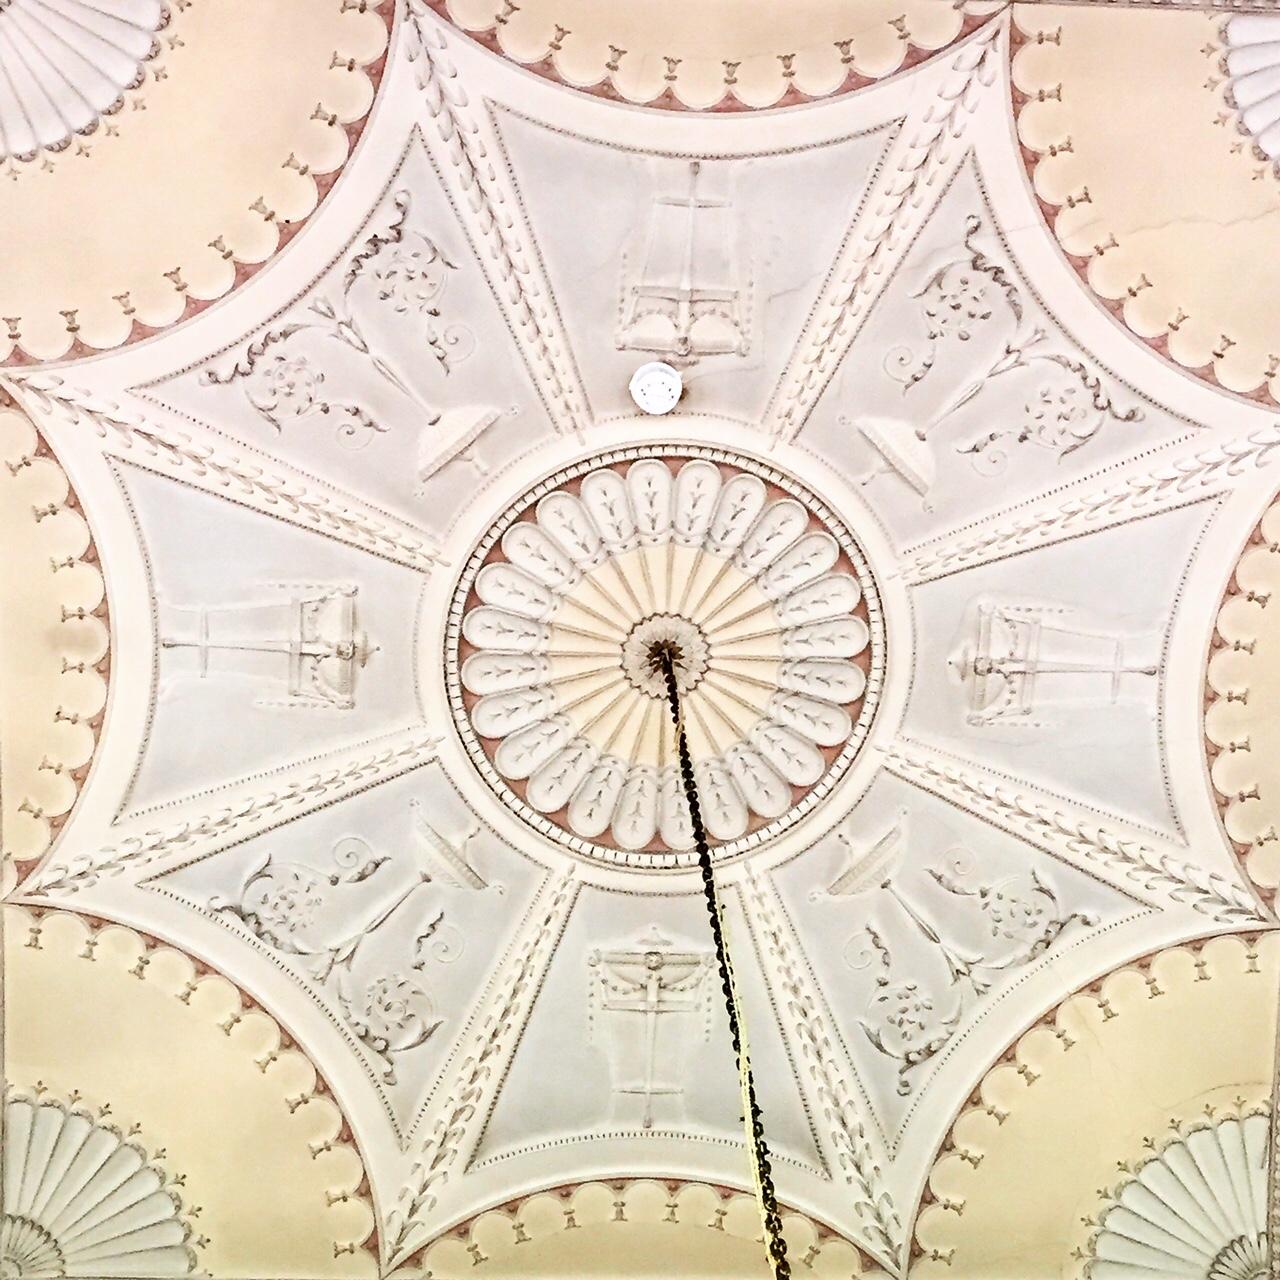 Milton Abbey Ballroom Ceiling